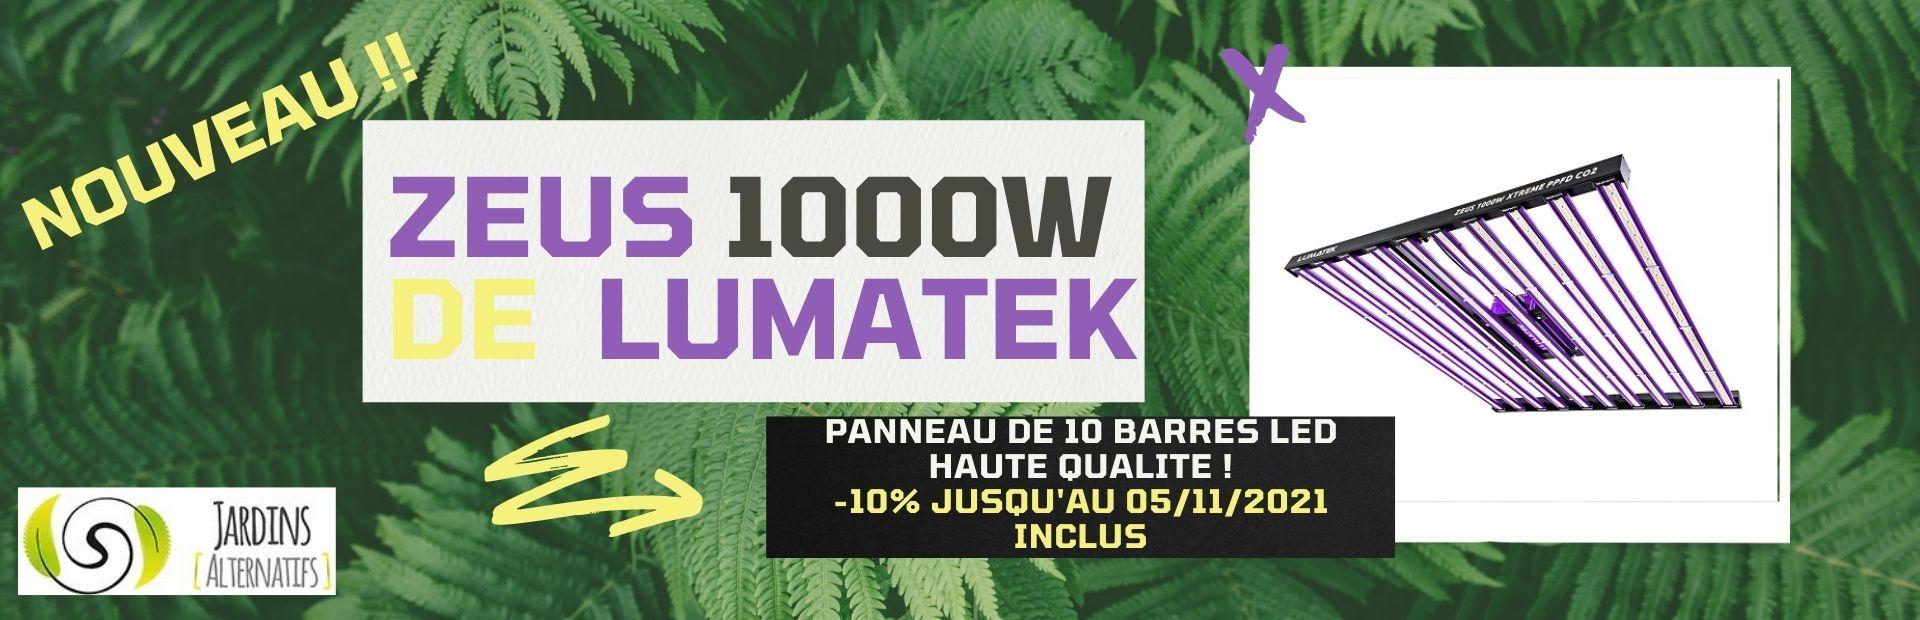 JARDINS ALTERNATIFS LUMATEK ZEUS 1000 en promo